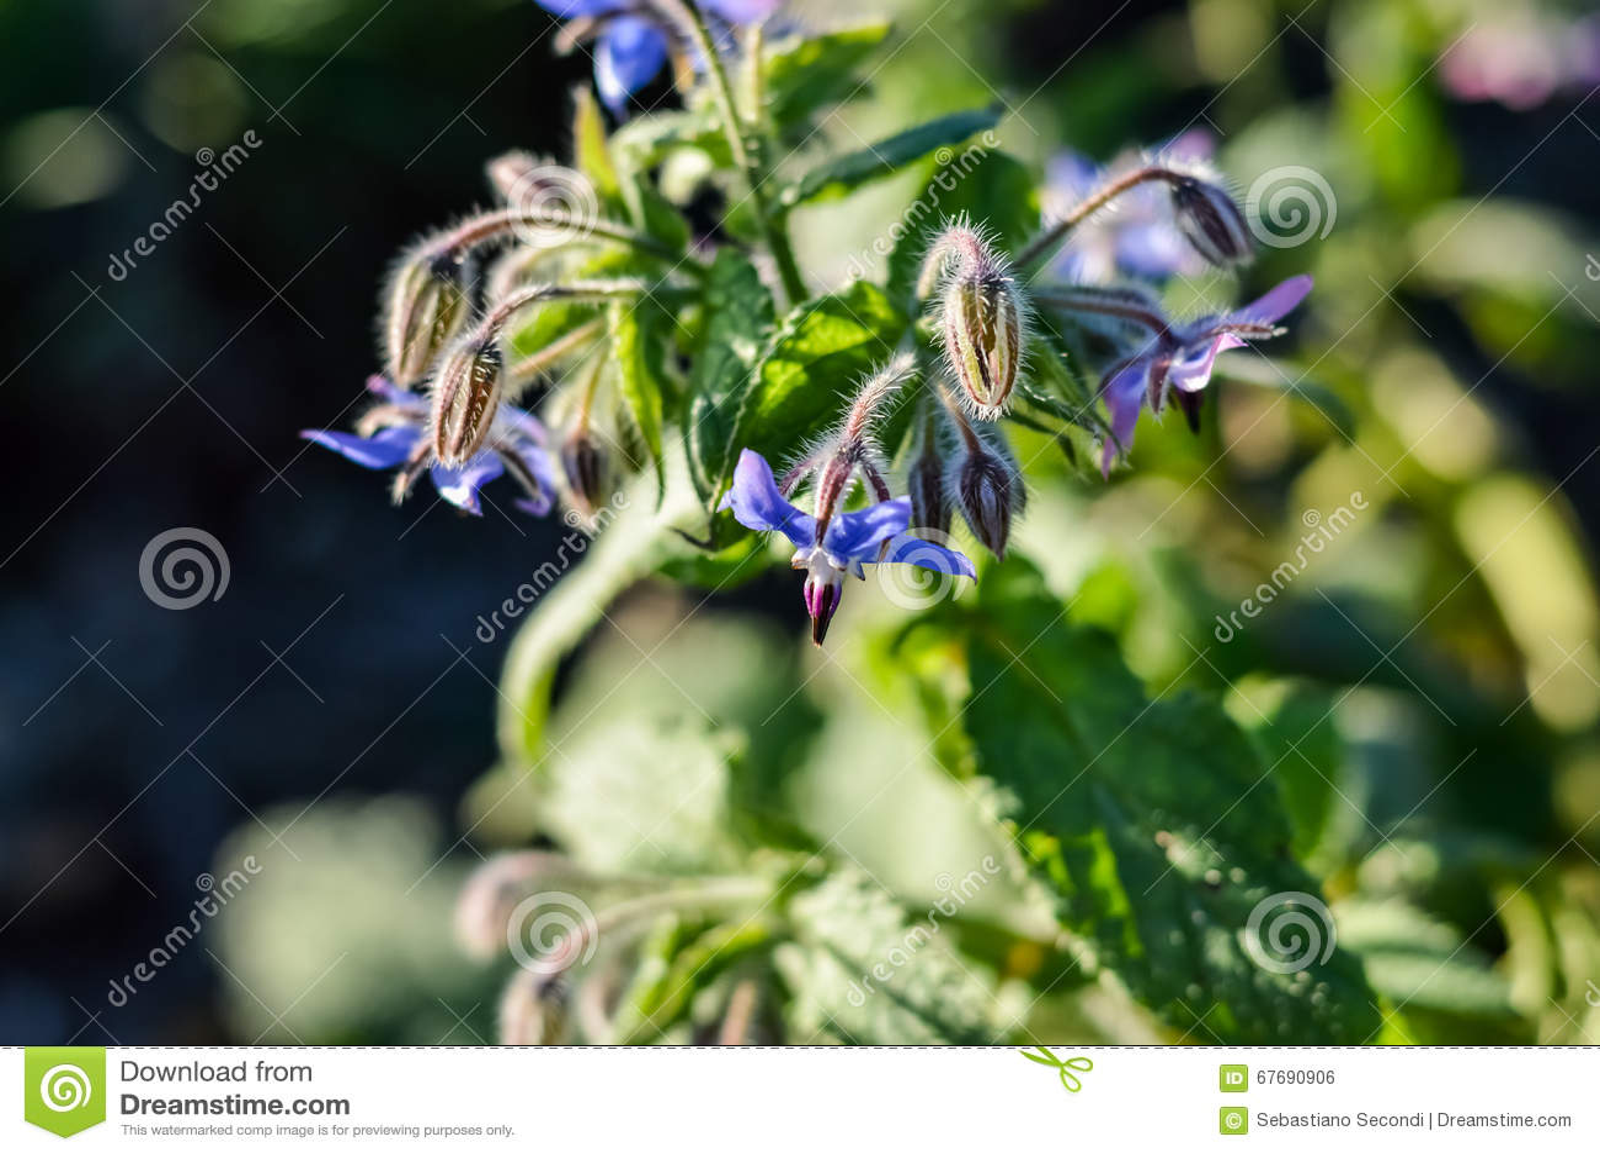 琉璃苣花(紫草科officinalis)